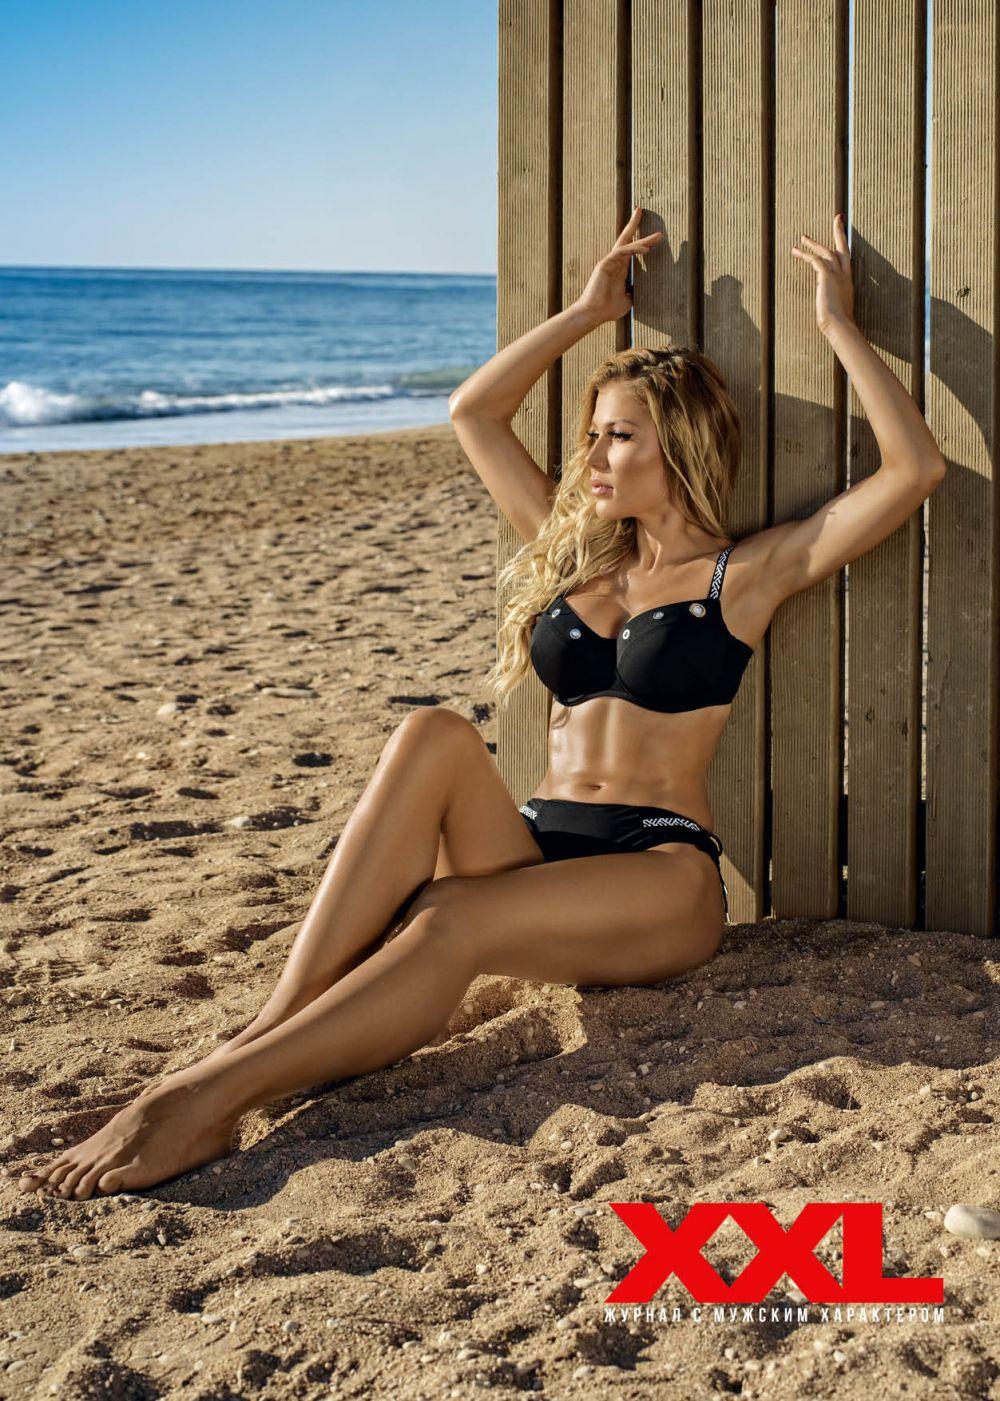 Съемка прошла на берегу моря в Турции, где Алена запечатлена на залитом солнцем пляже в купальниках и без.